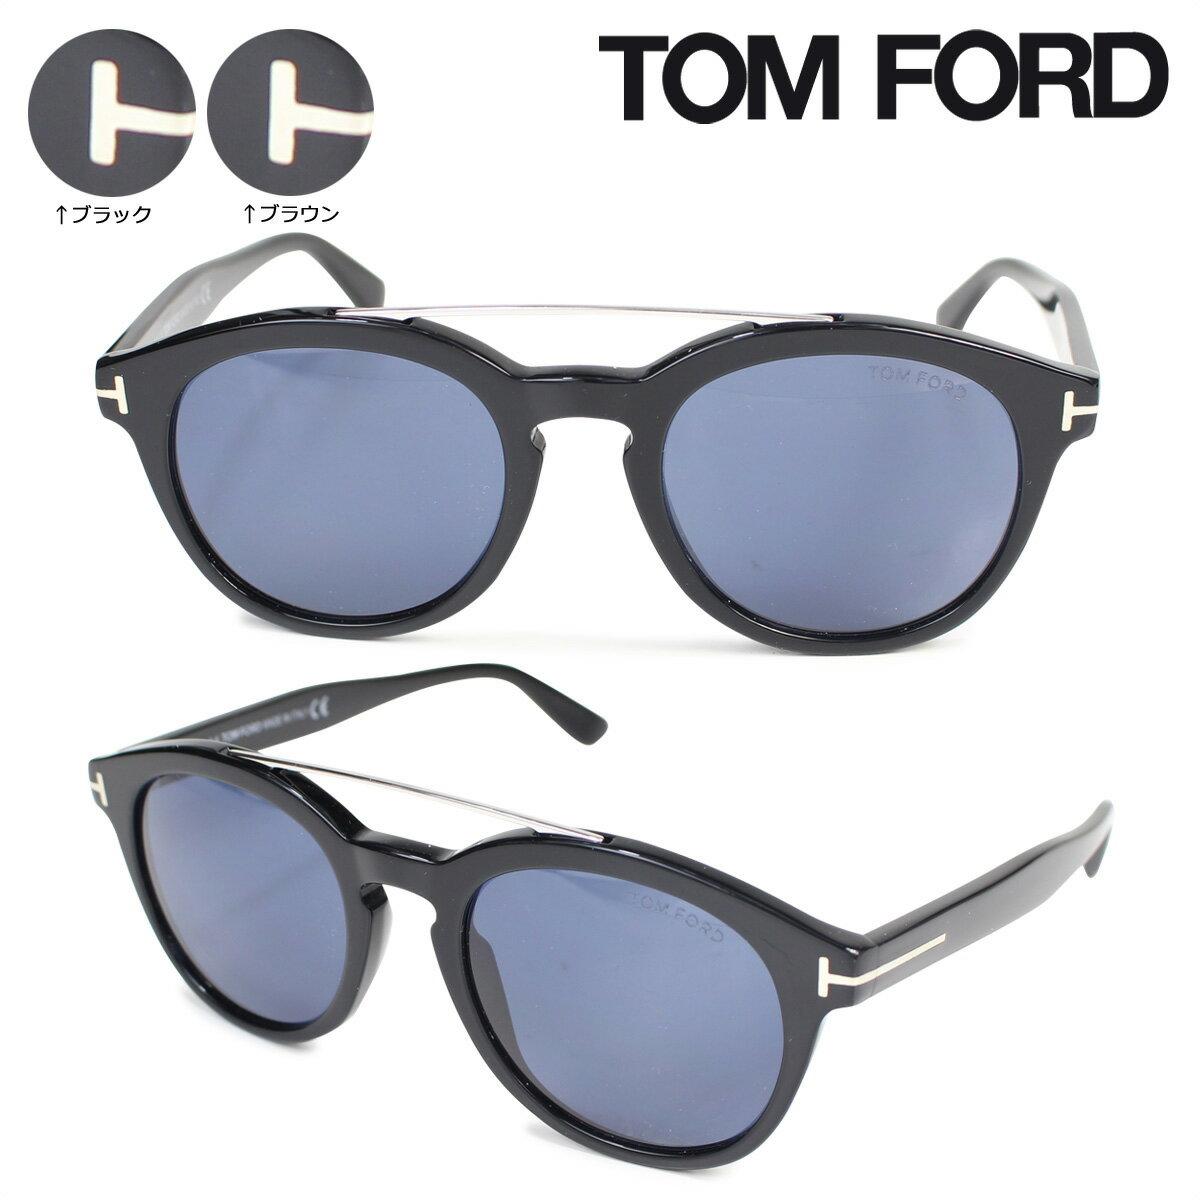 TOM FORD トムフォード サングラス メガネ メンズ レディース アイウェア FT0515 NEWMAN SUNGLASSES 2カラー 【決算セール】